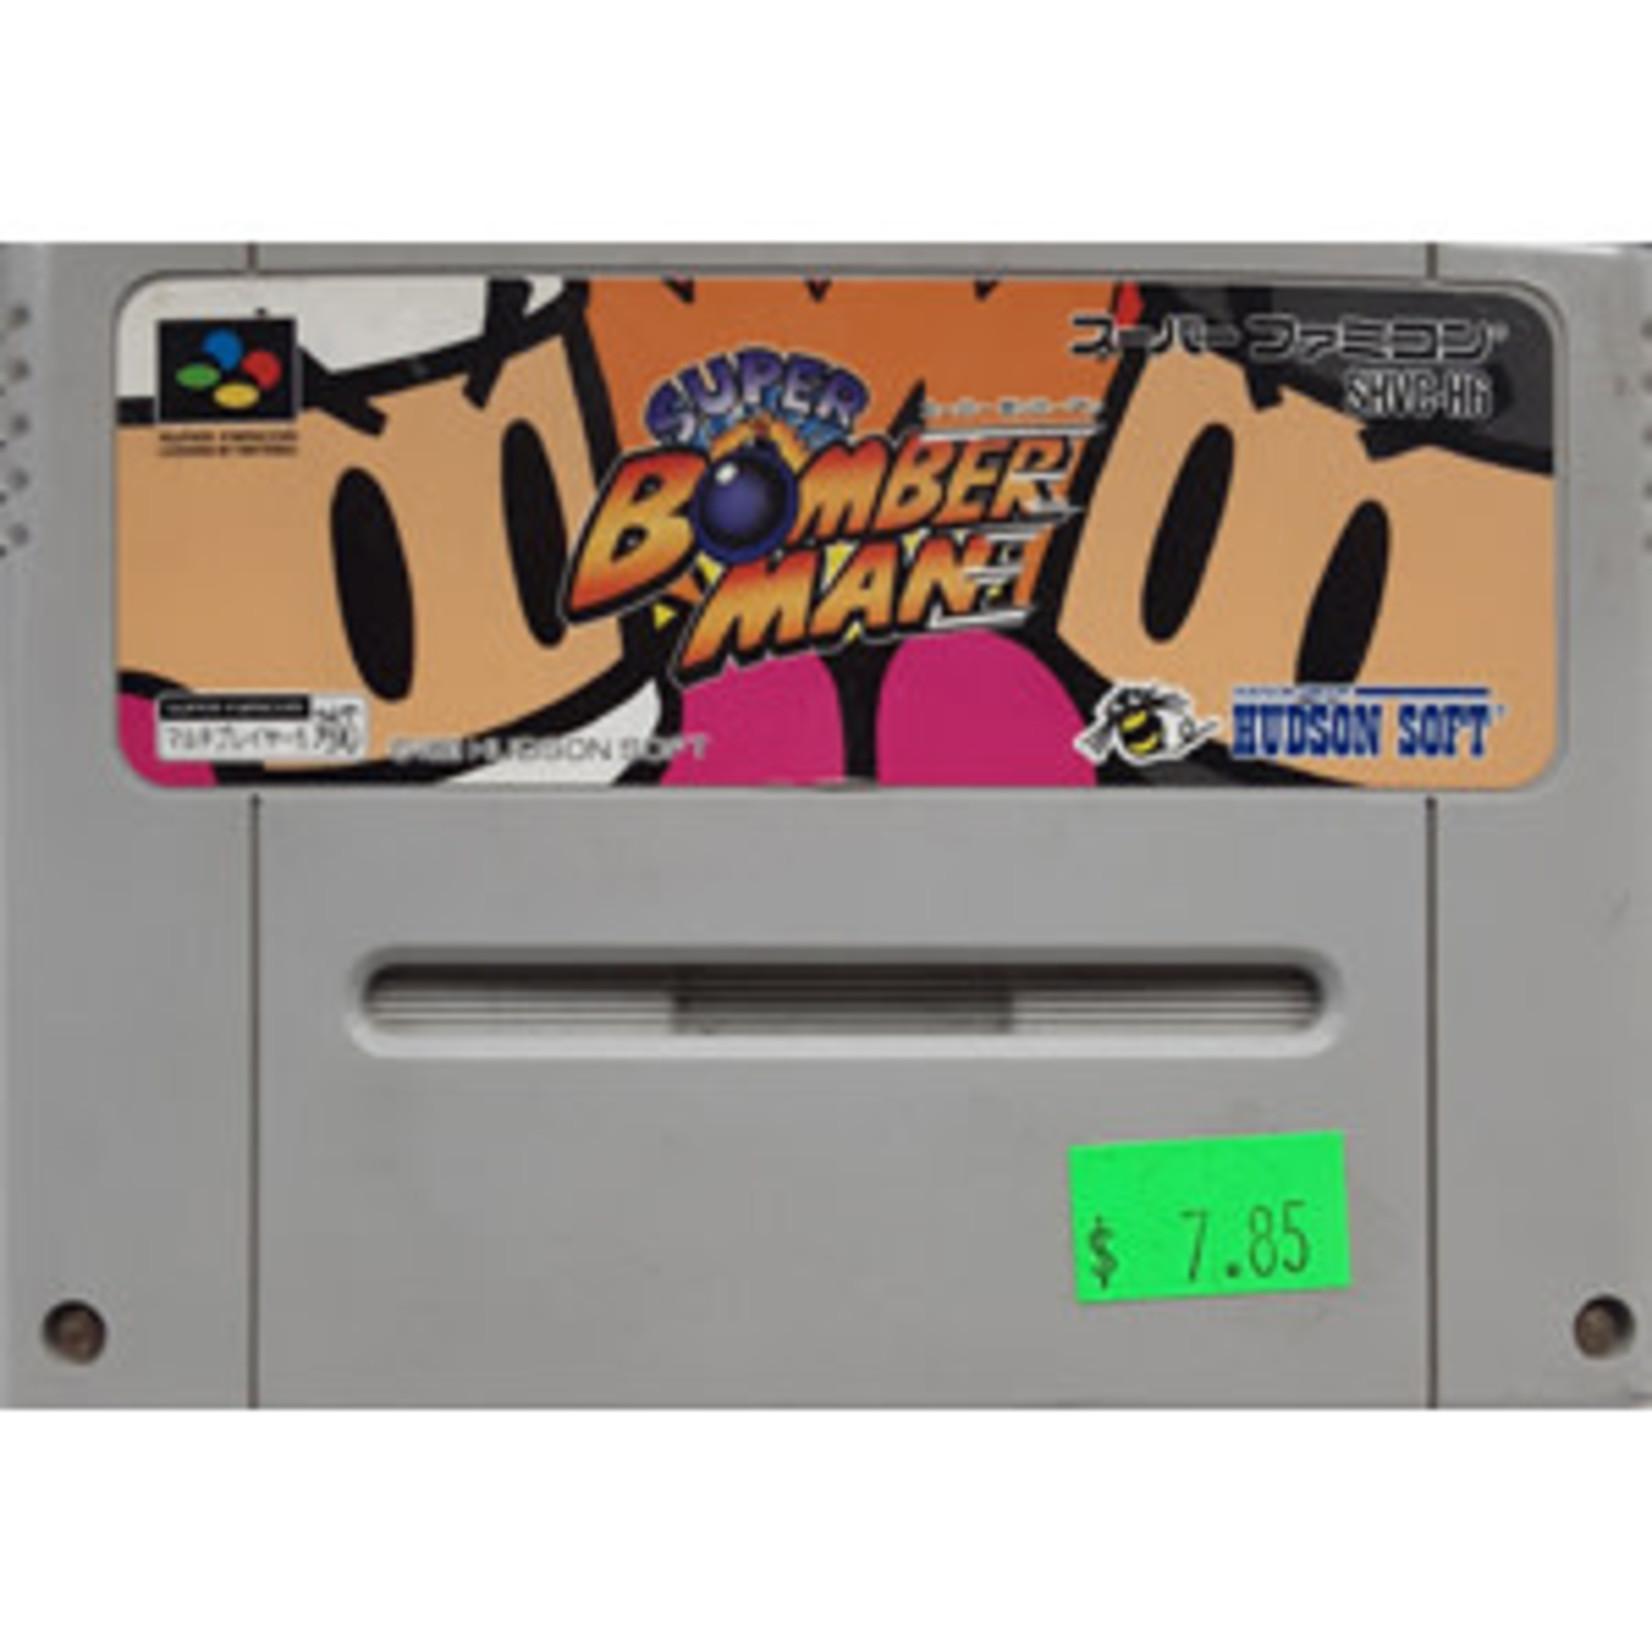 IMPORT-SFCU-Super Bomber Man